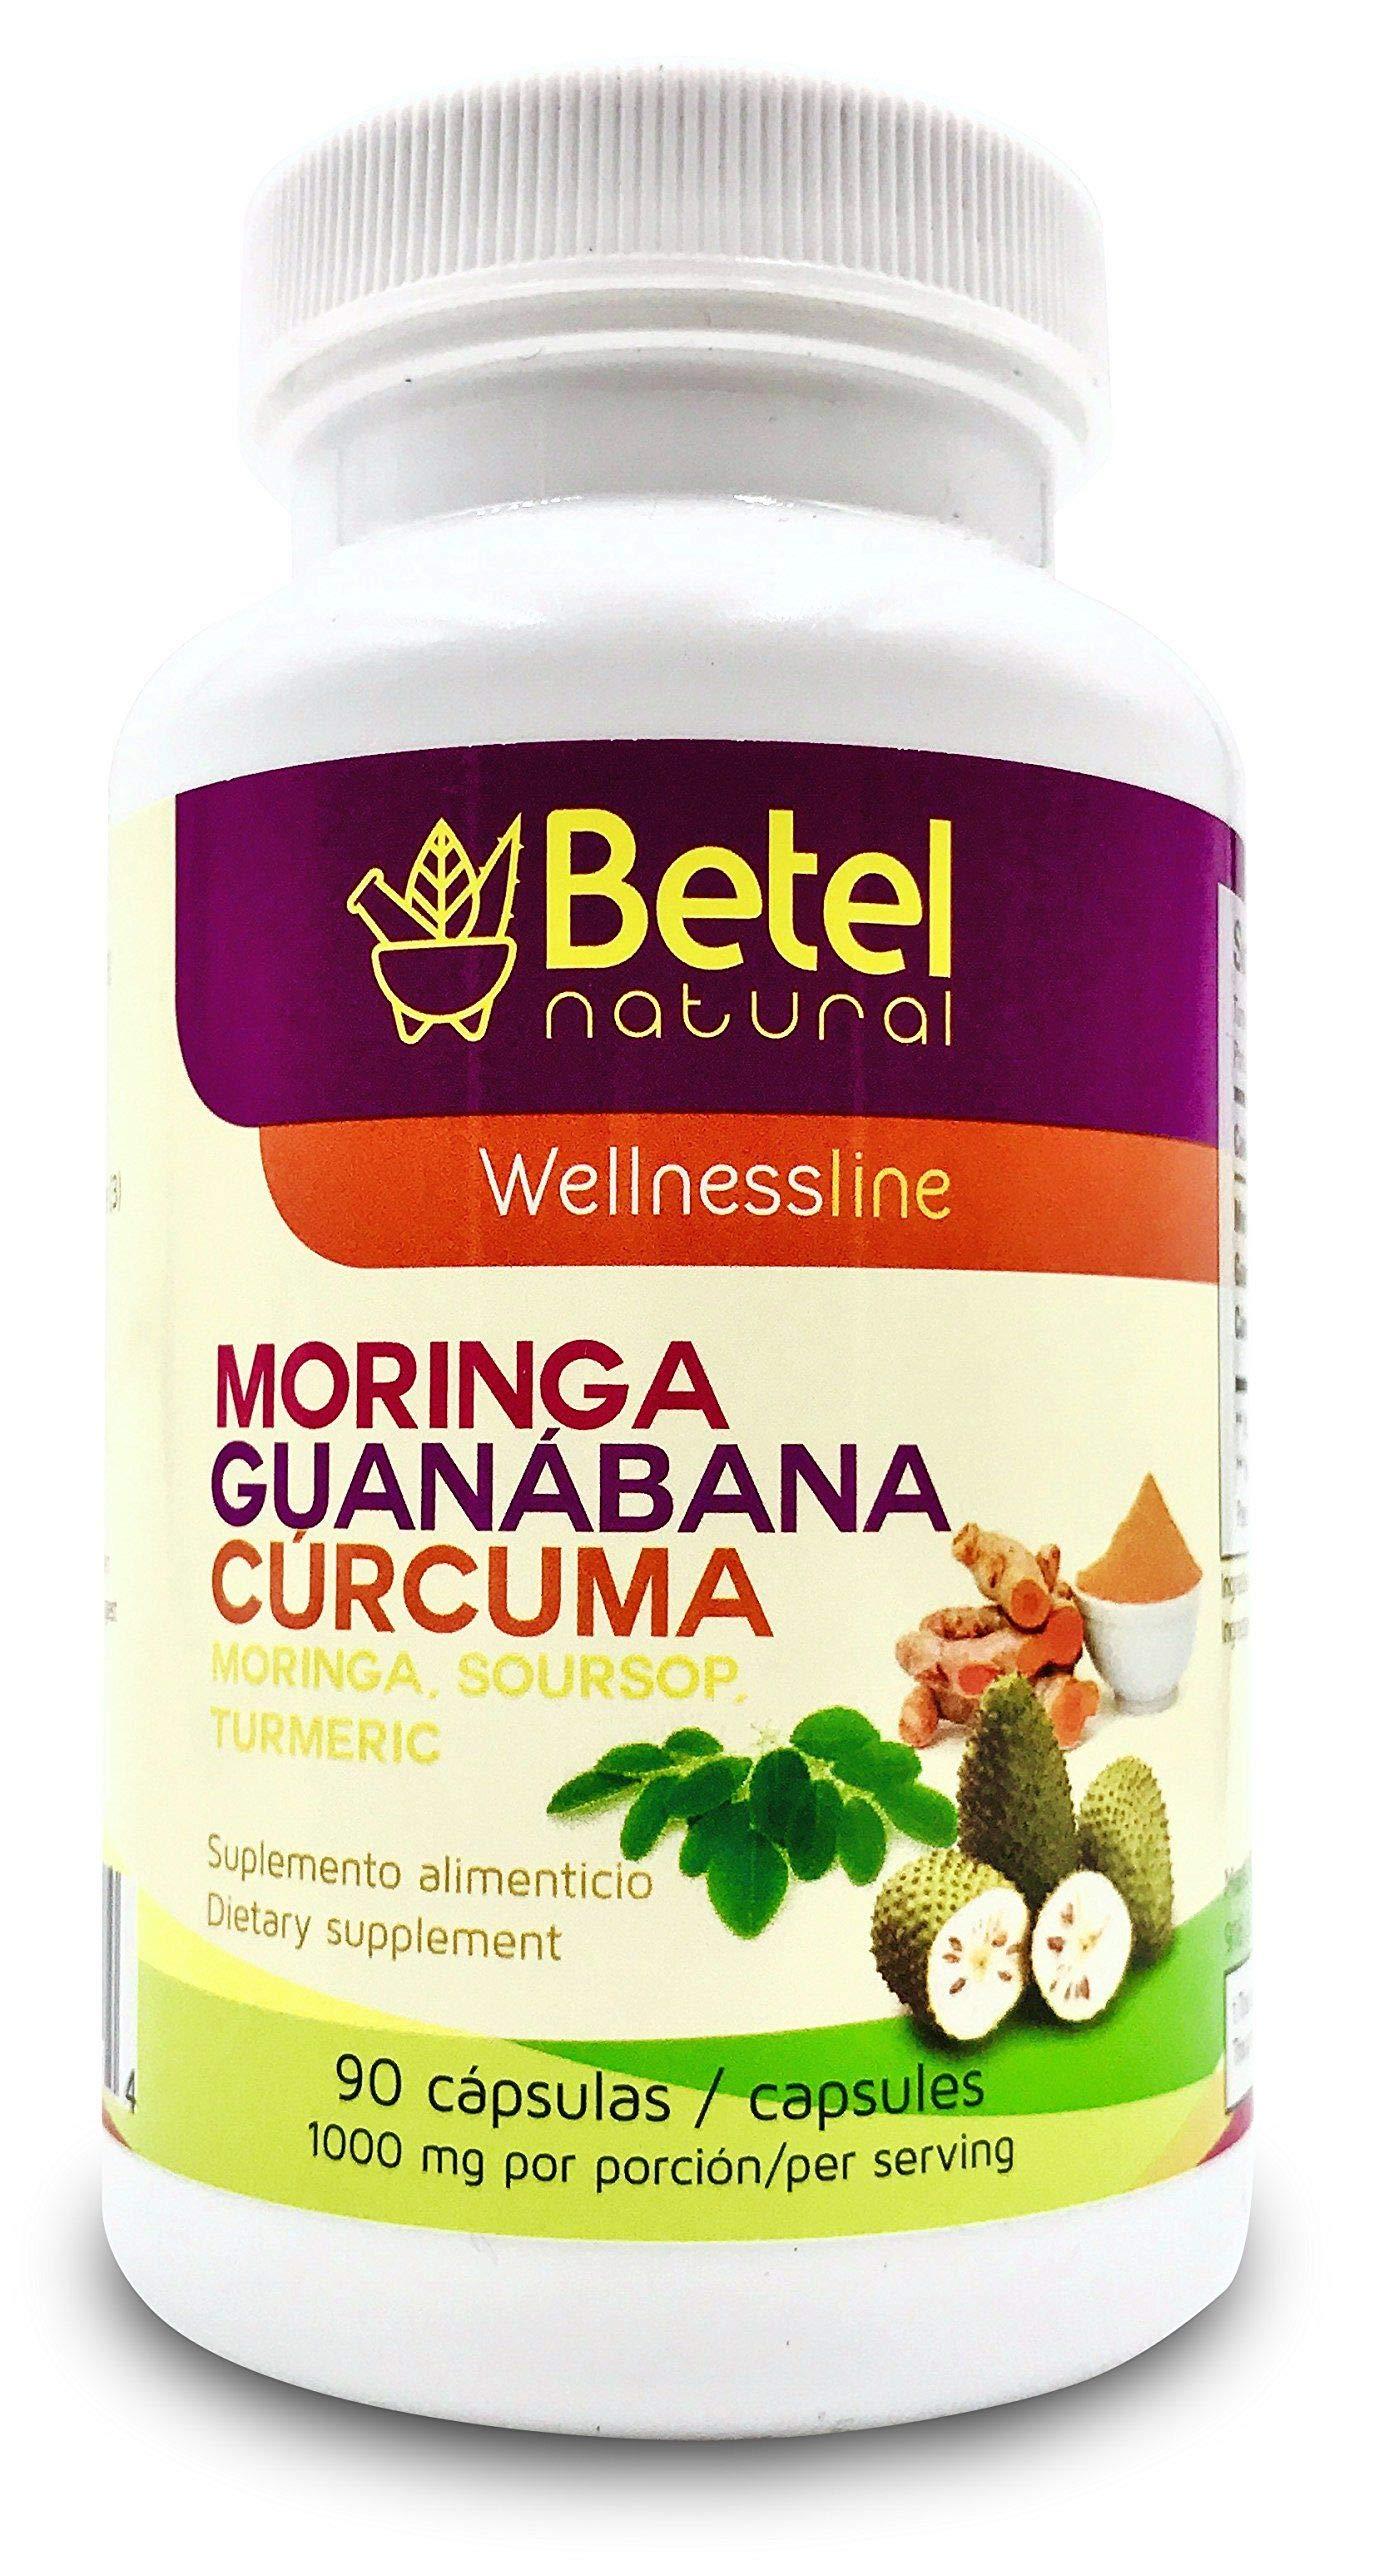 Moringa Guanabana and Curcuma 90 Capsules - Betel Natural